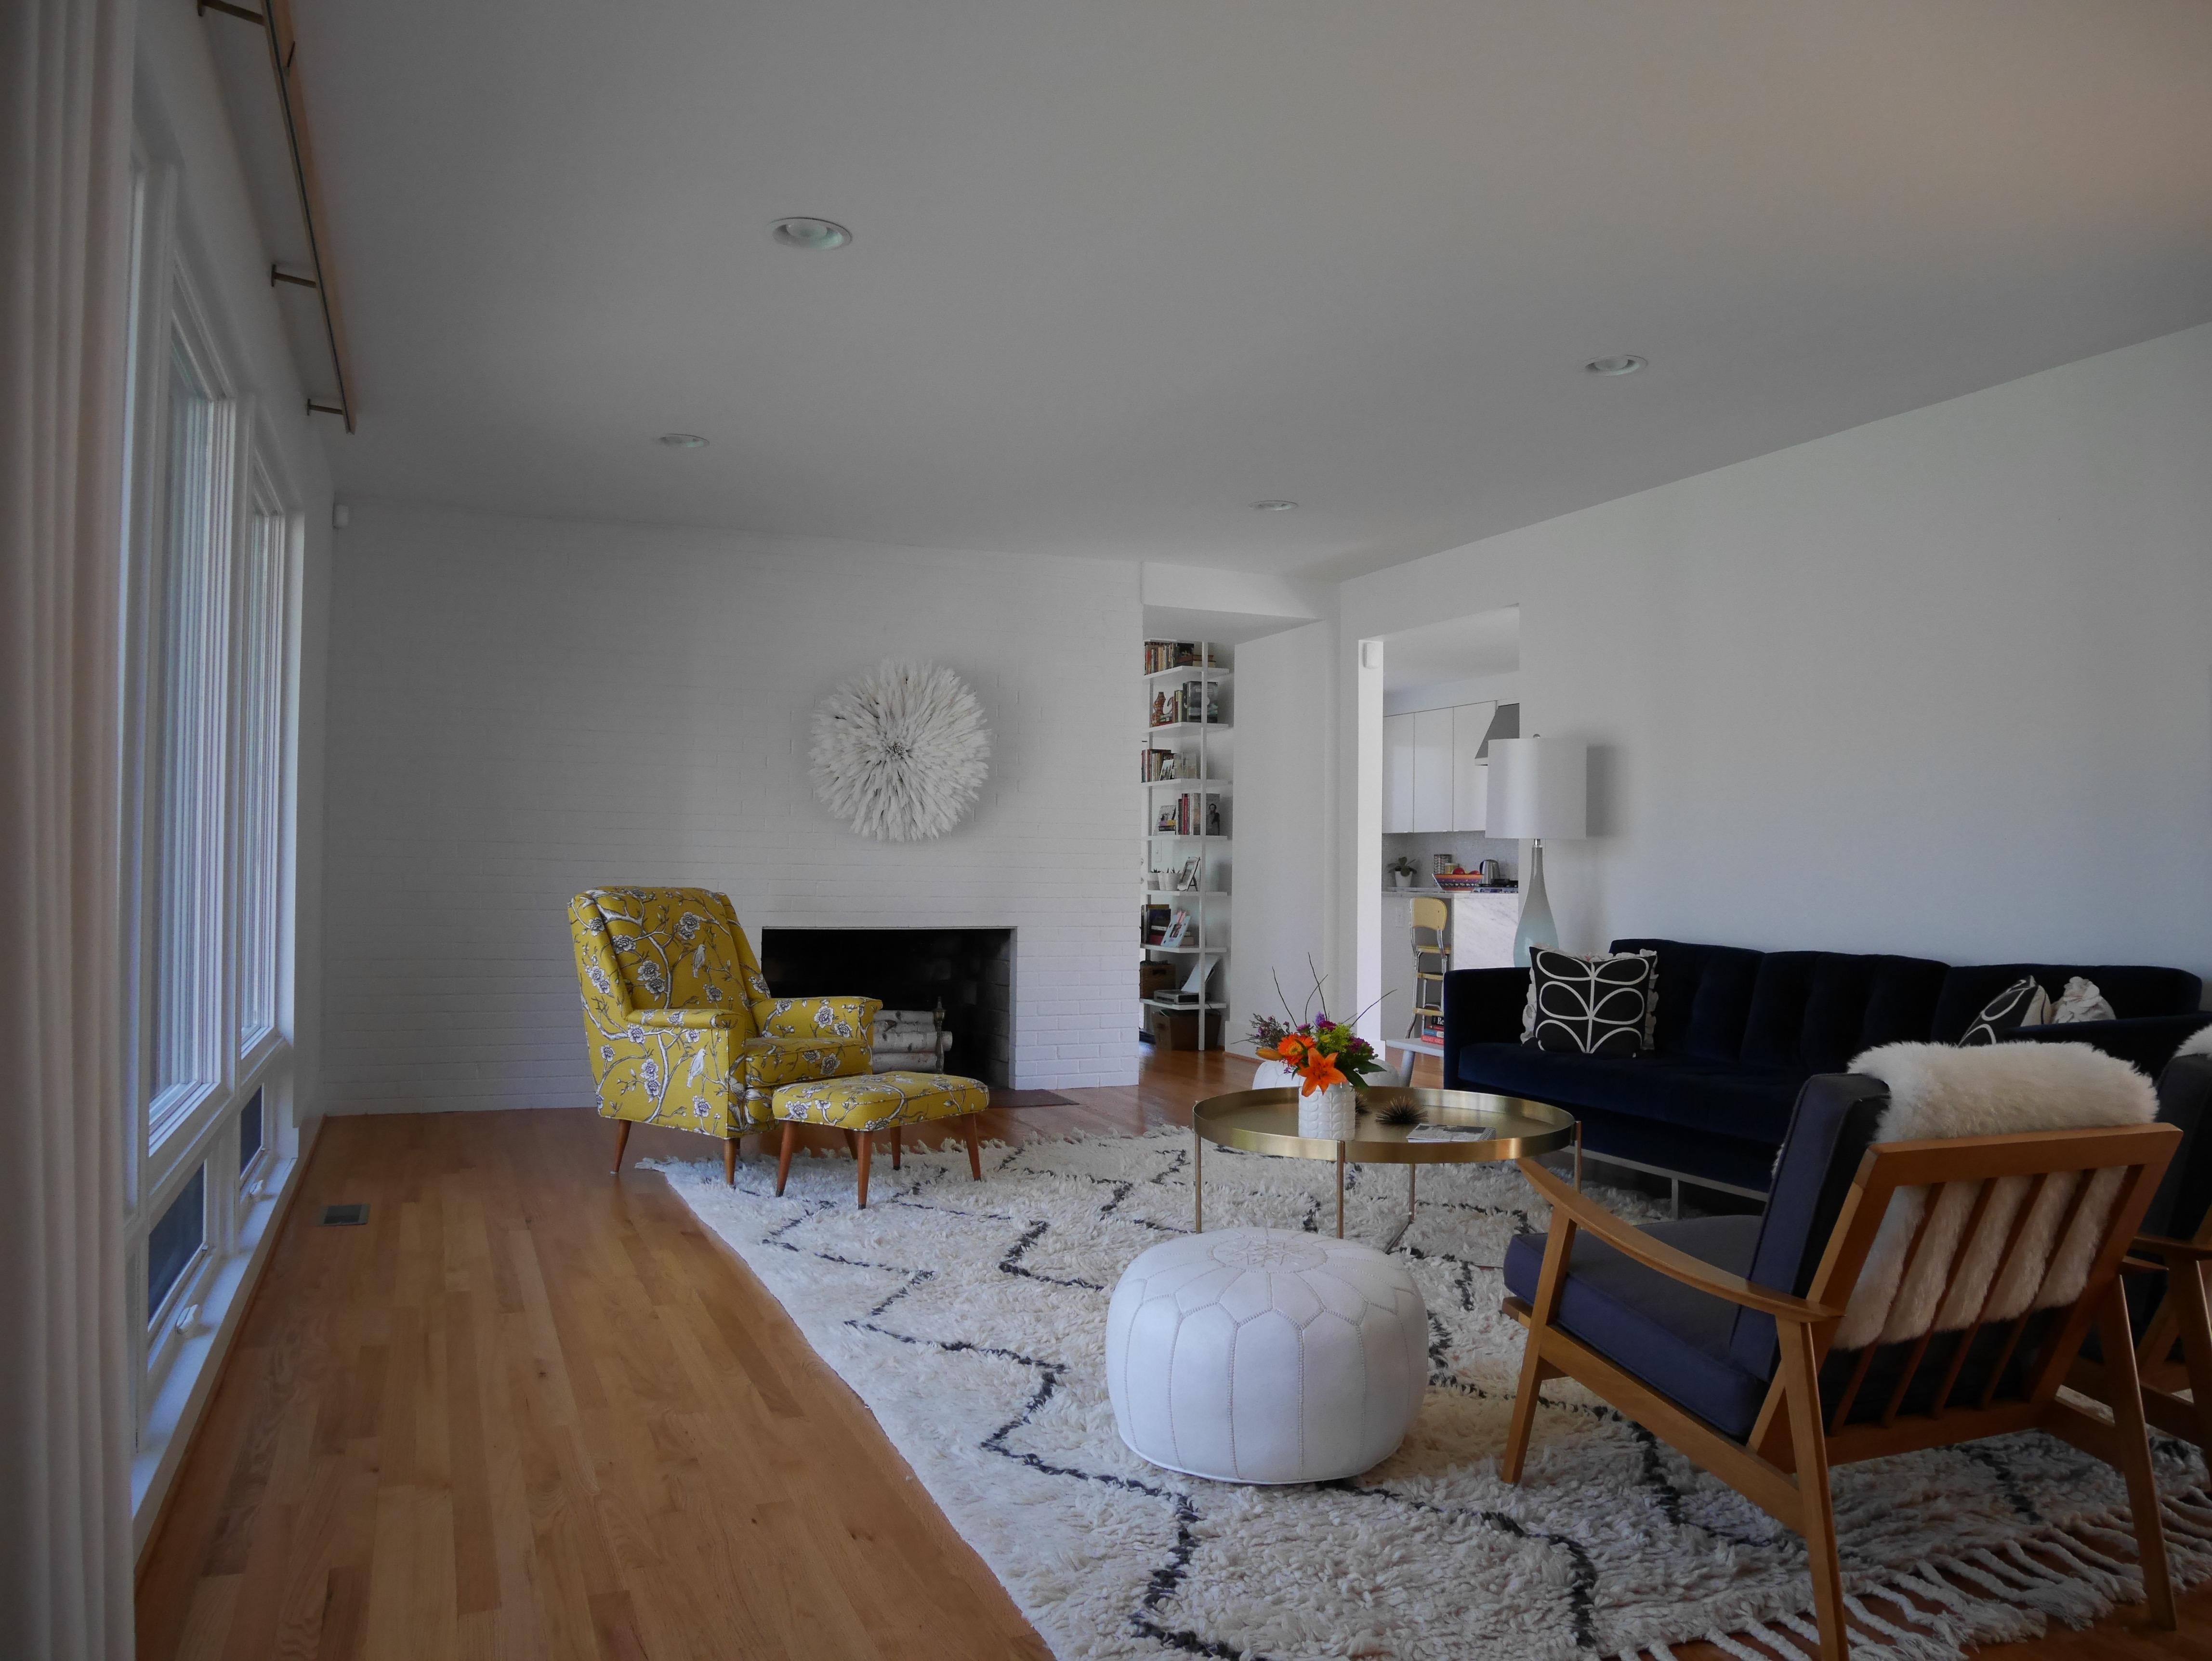 family interior nc greensboro raleigh design designers lines room